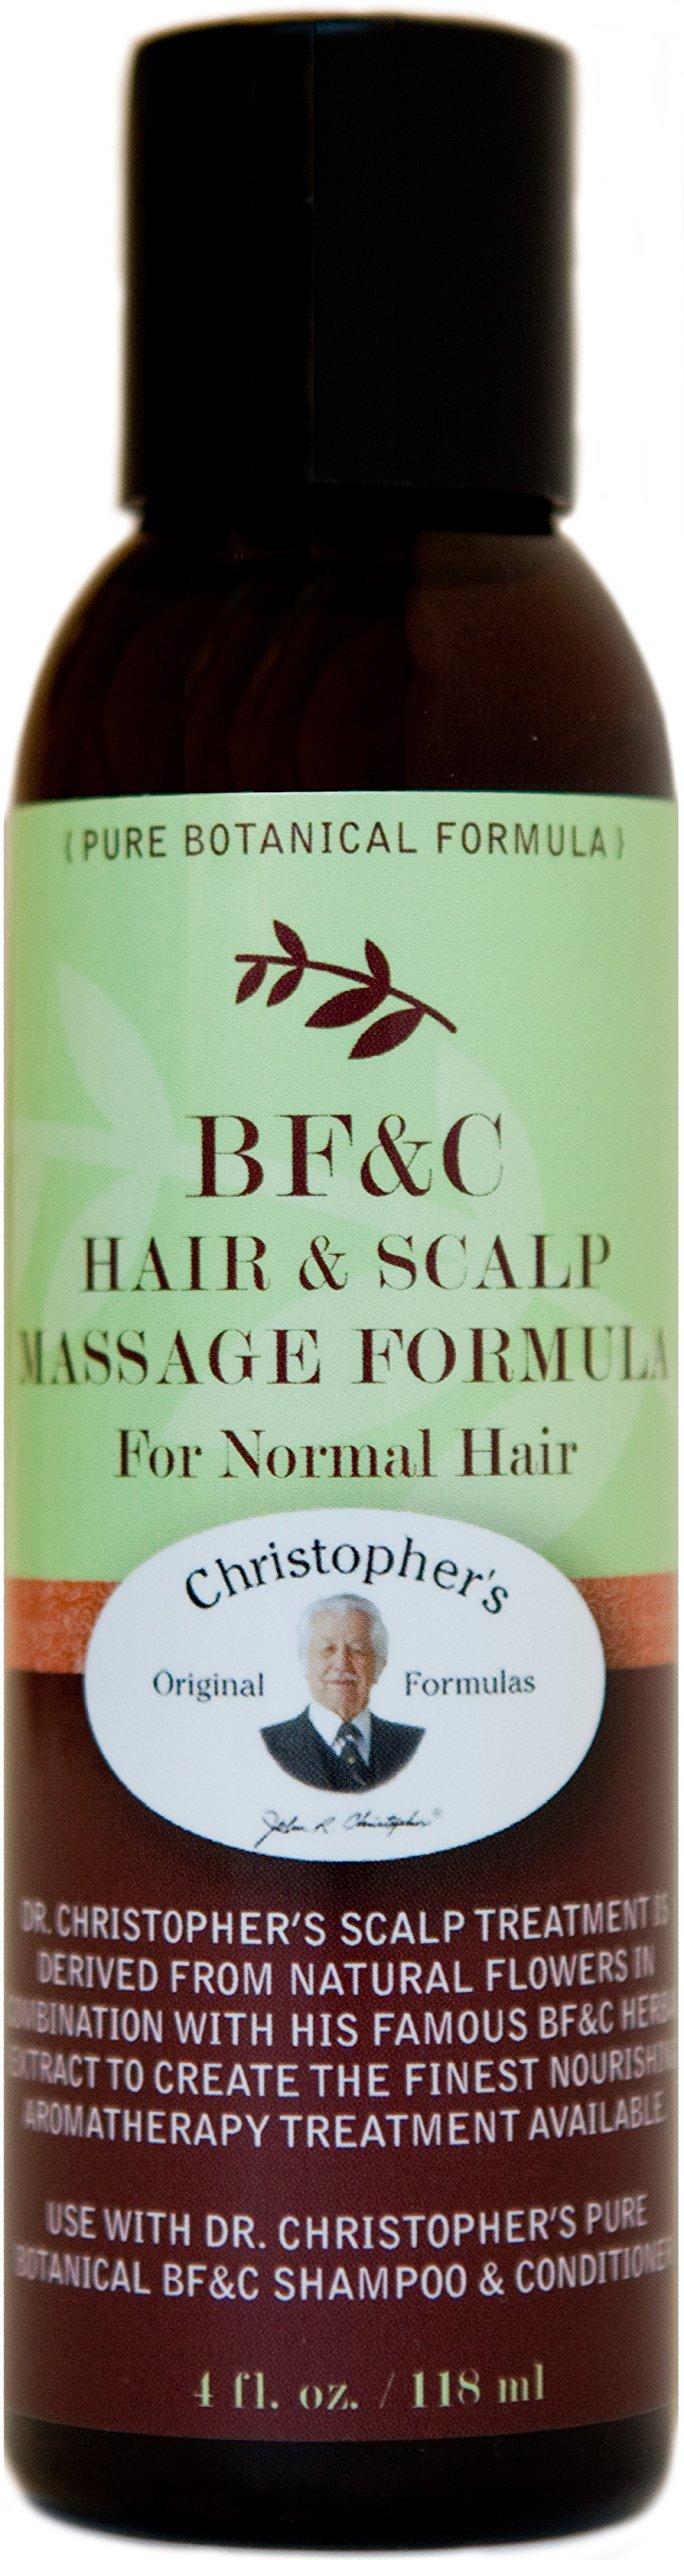 BF&C Hair & Scalp Massage Oil Dr. Christopher 4 oz Oil